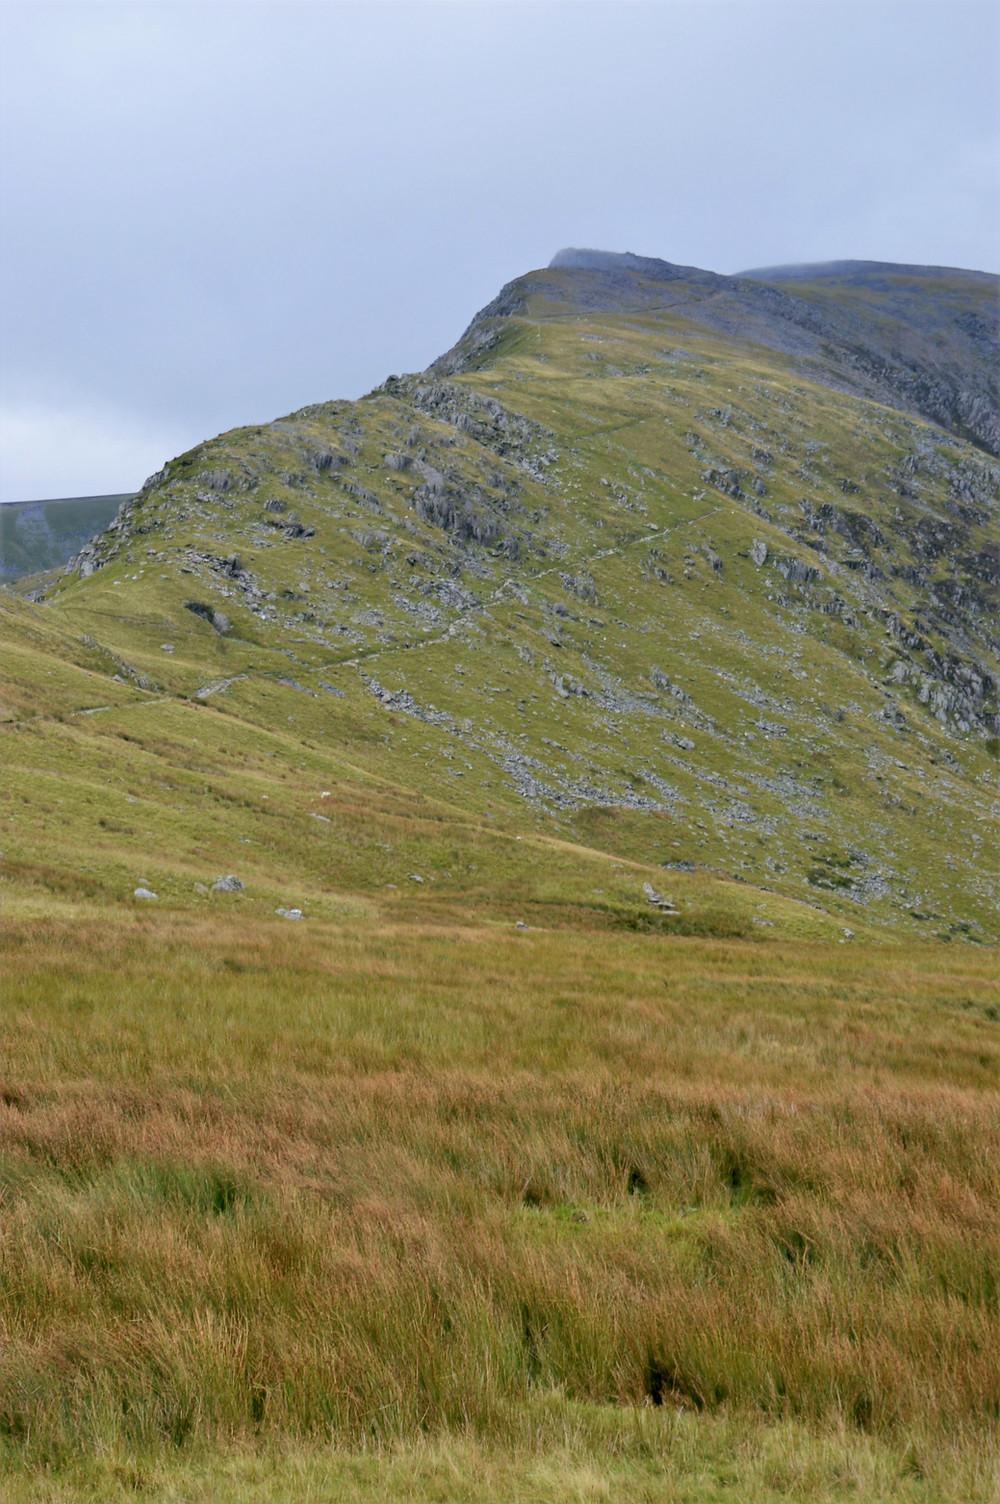 Snowdon Ranger Path traversing just below the ridge line of Clogwyn Du'r Arddu